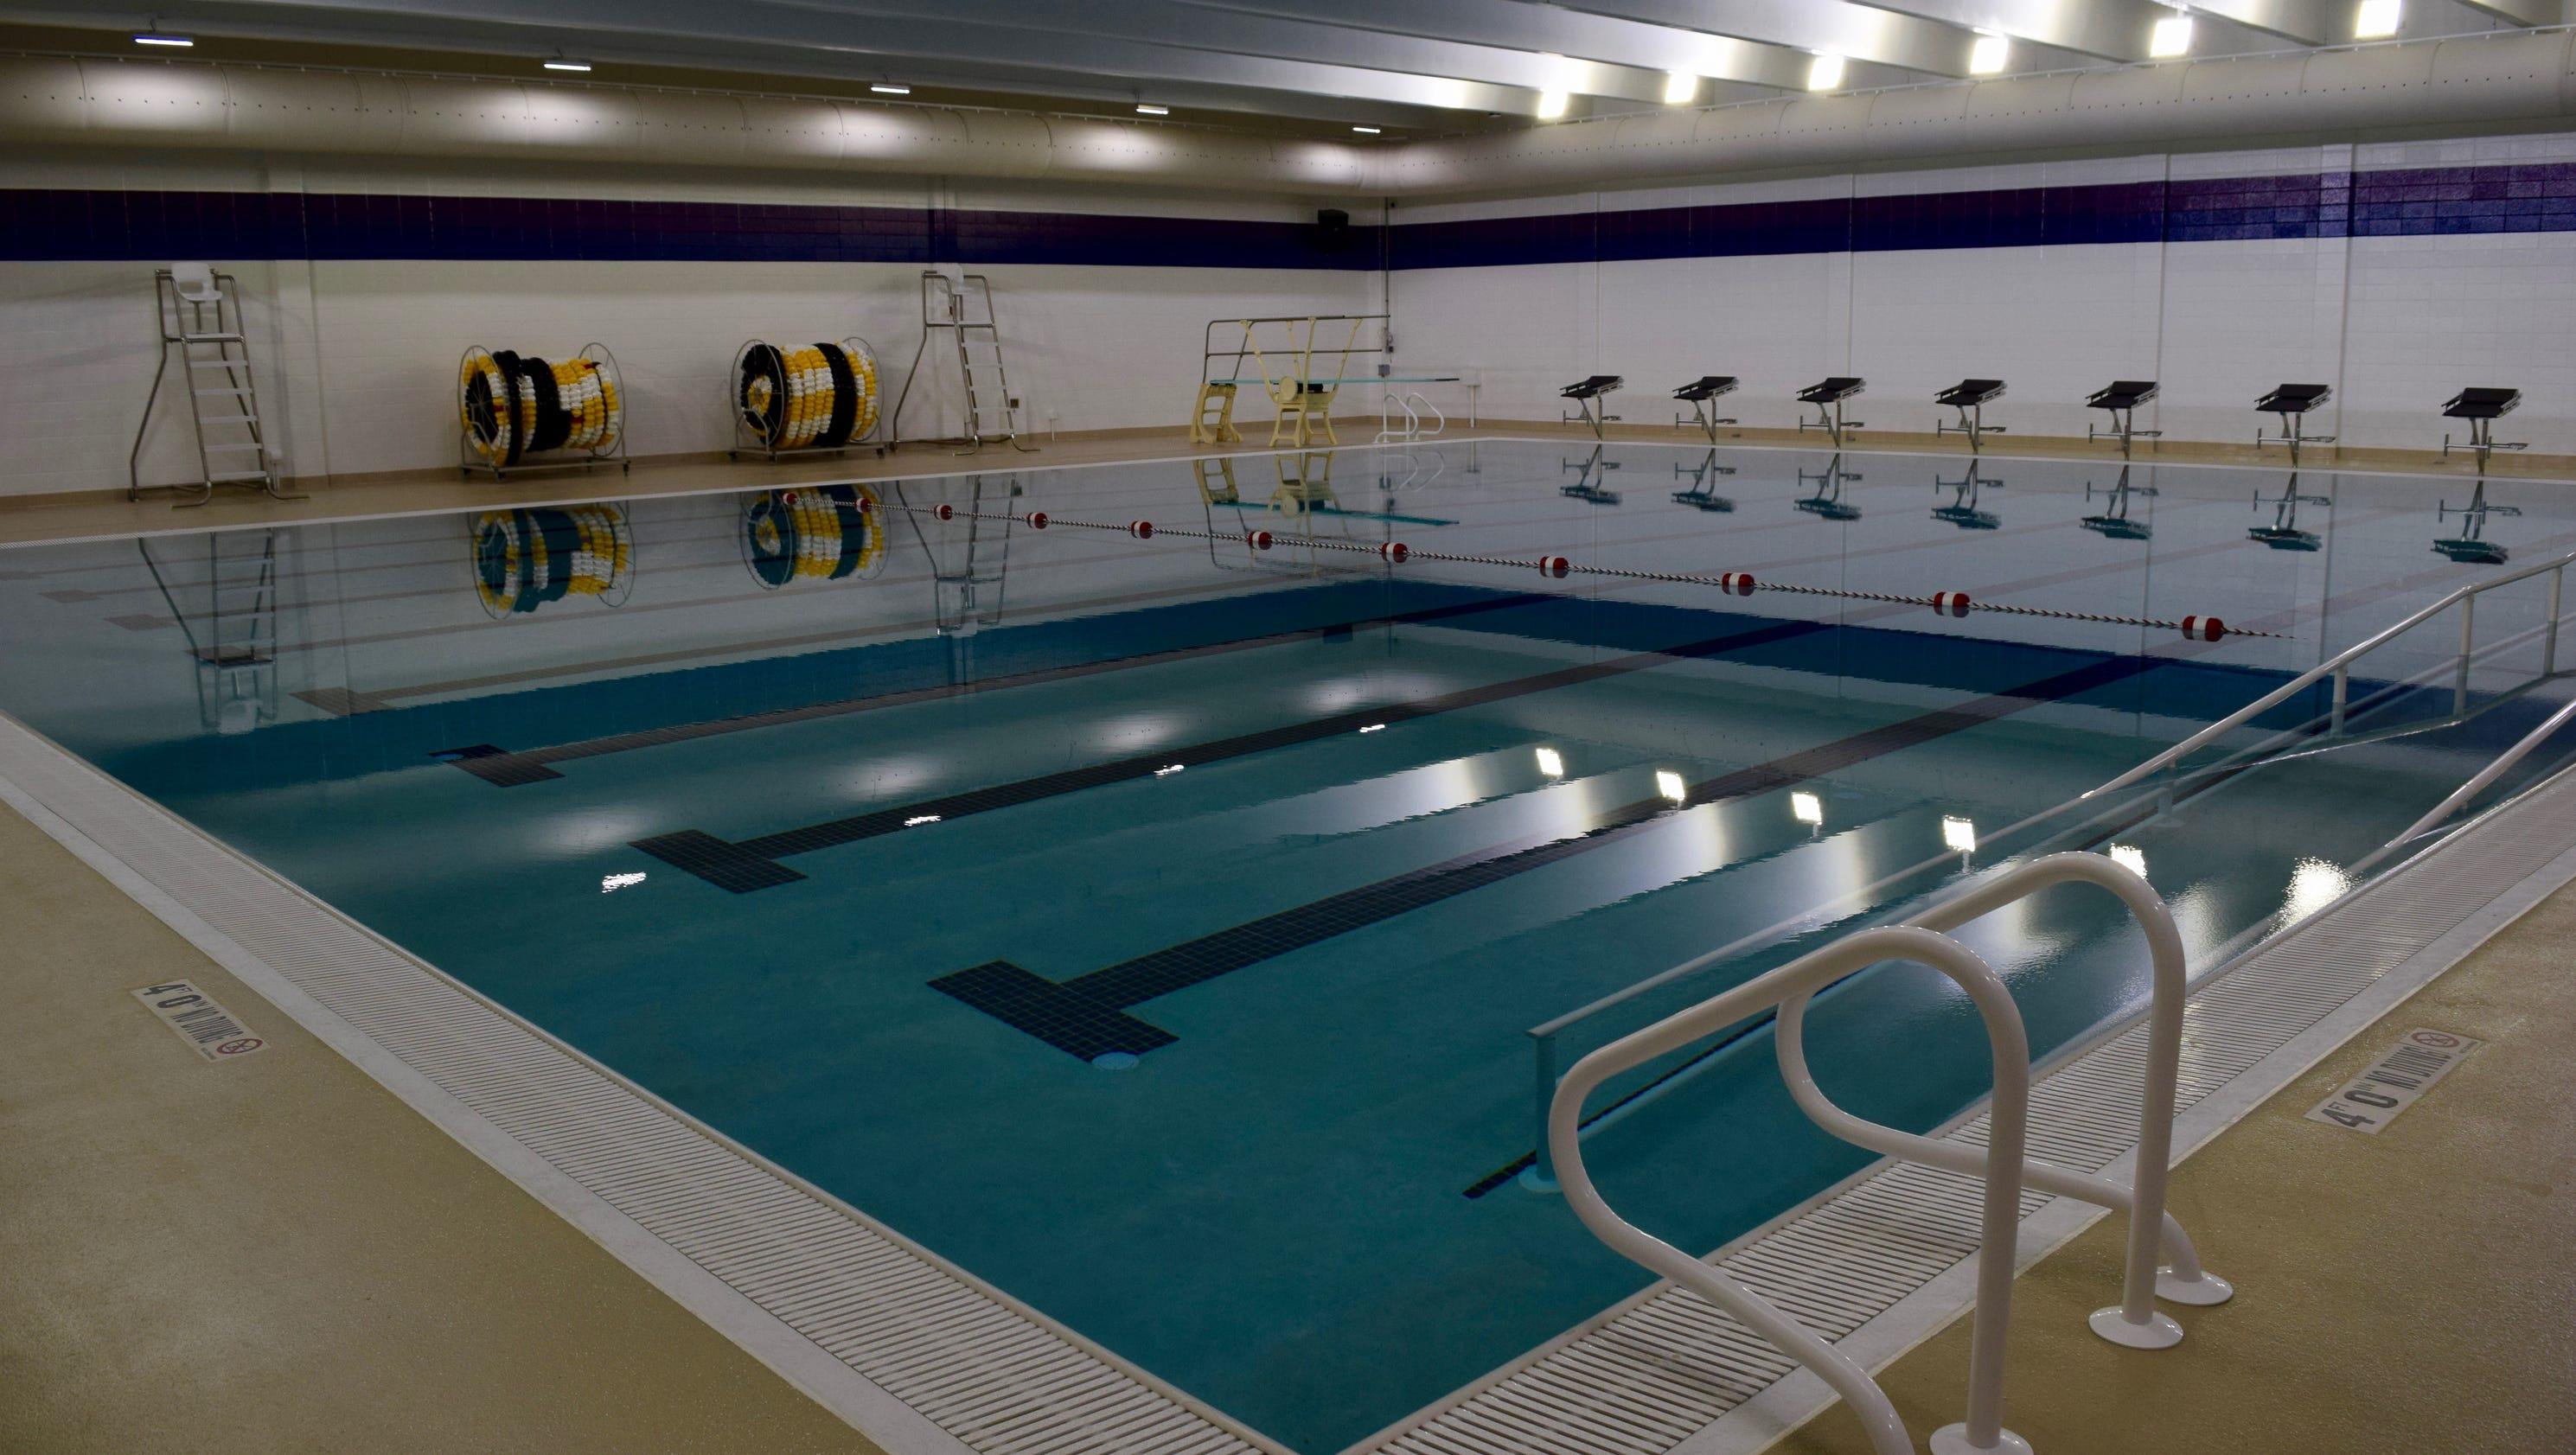 New pool to impact new berlin eisenhower swimming for Swimmingpool aufstellbecken pool